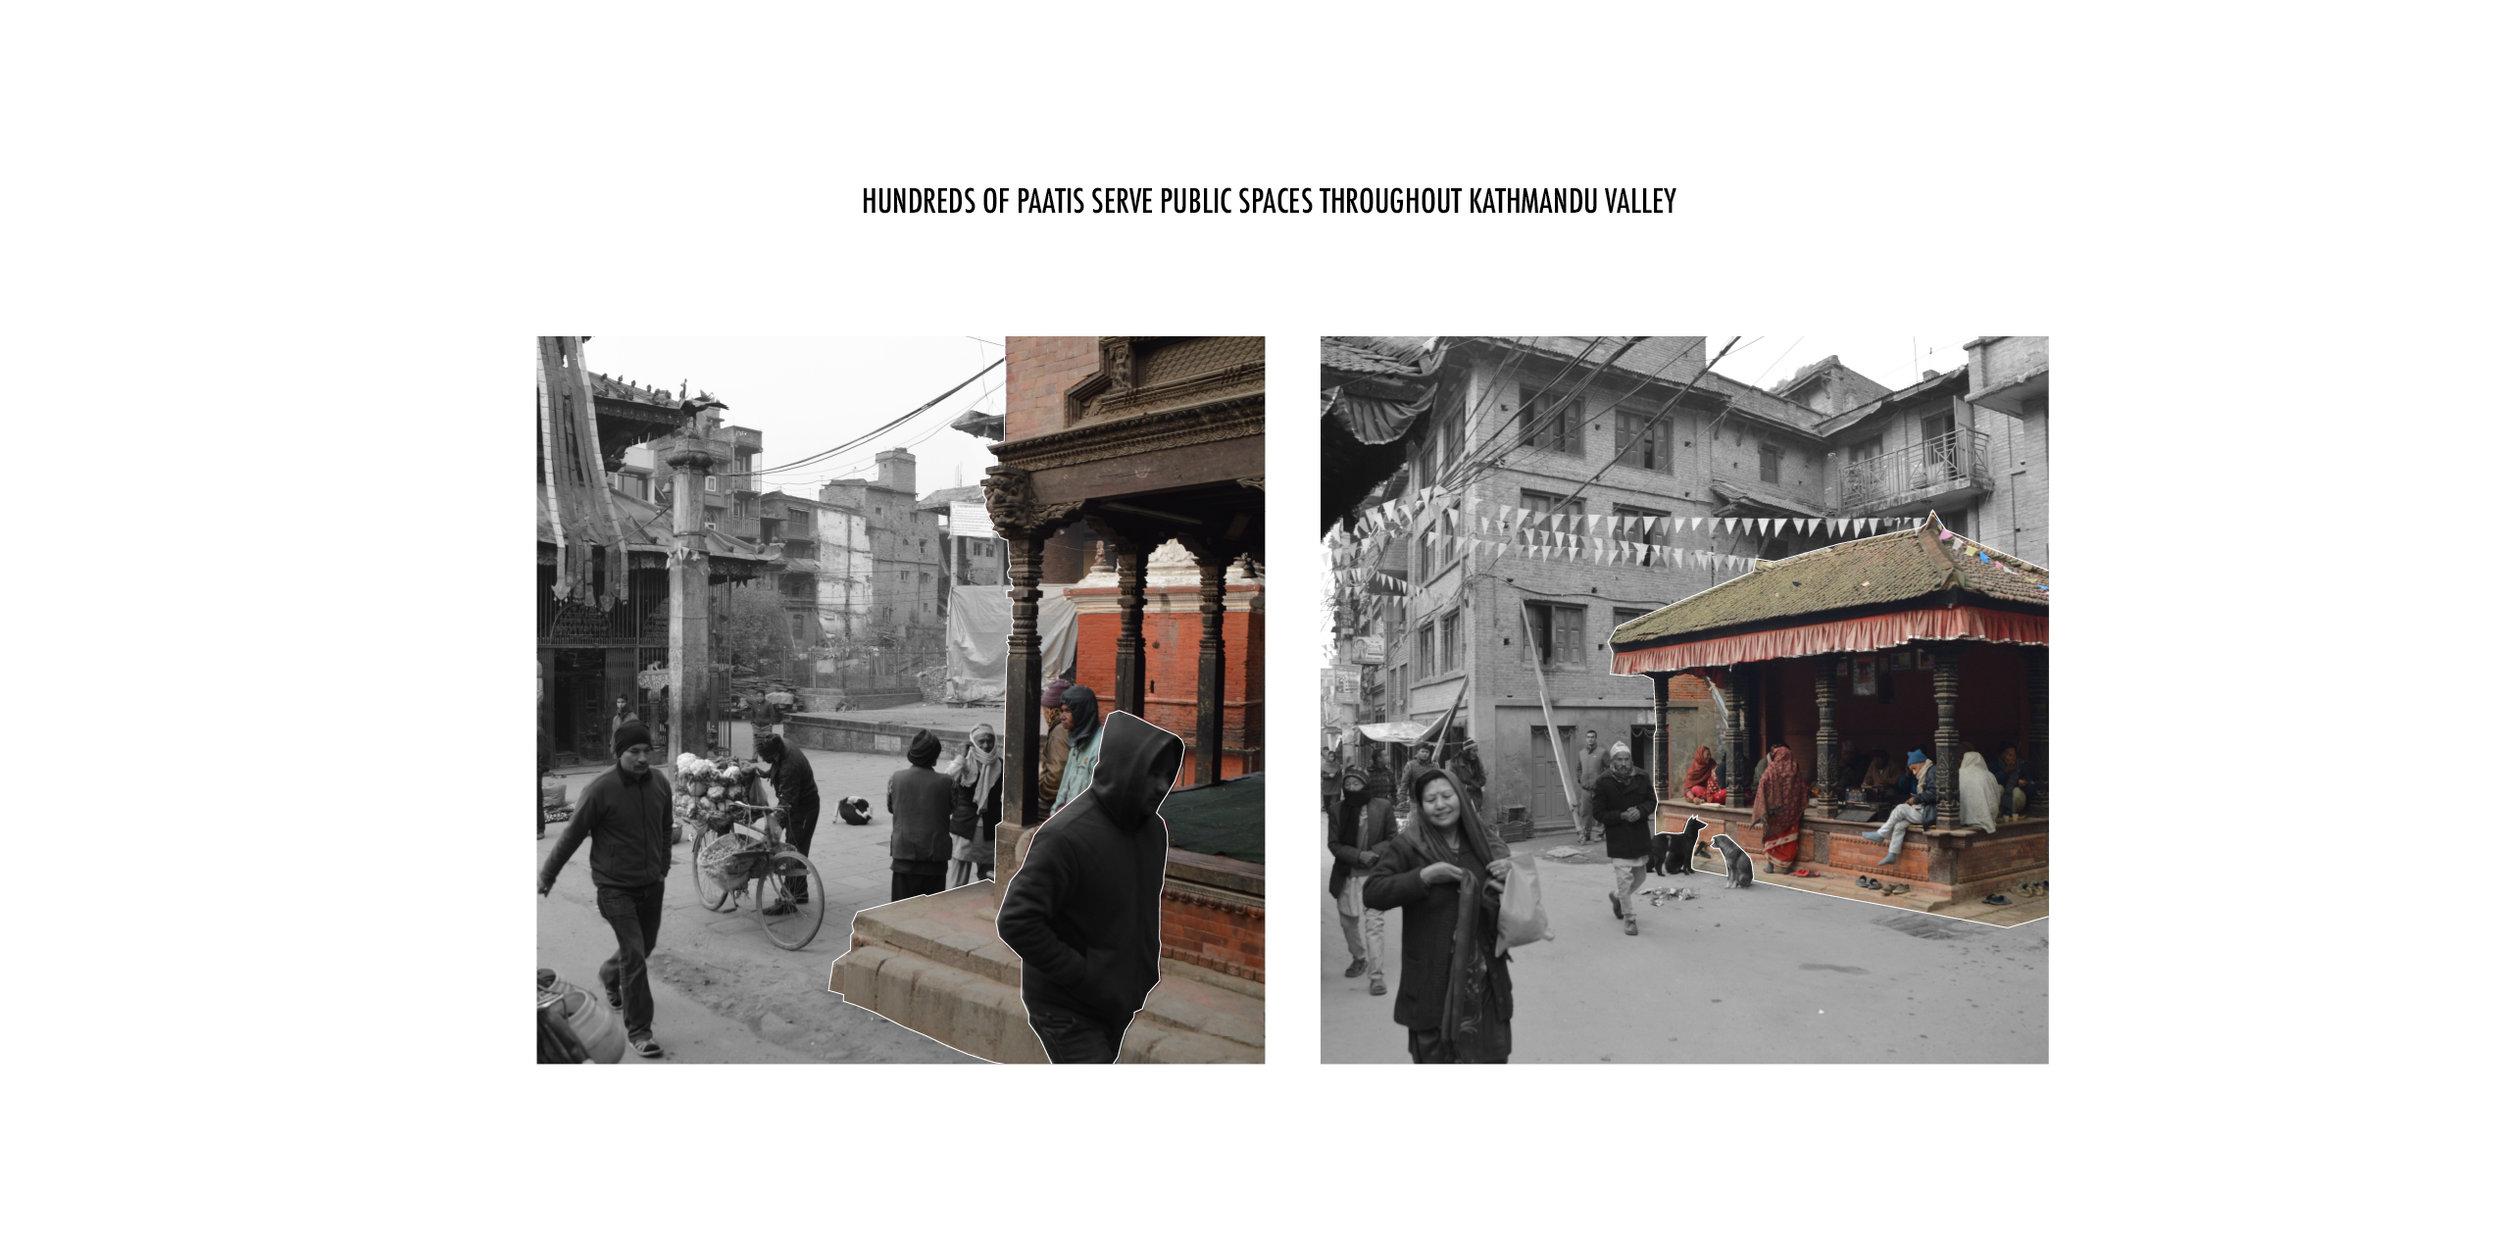 170109_PrepHub Nepal_Overview Digital Presentation_8.5x177.jpg